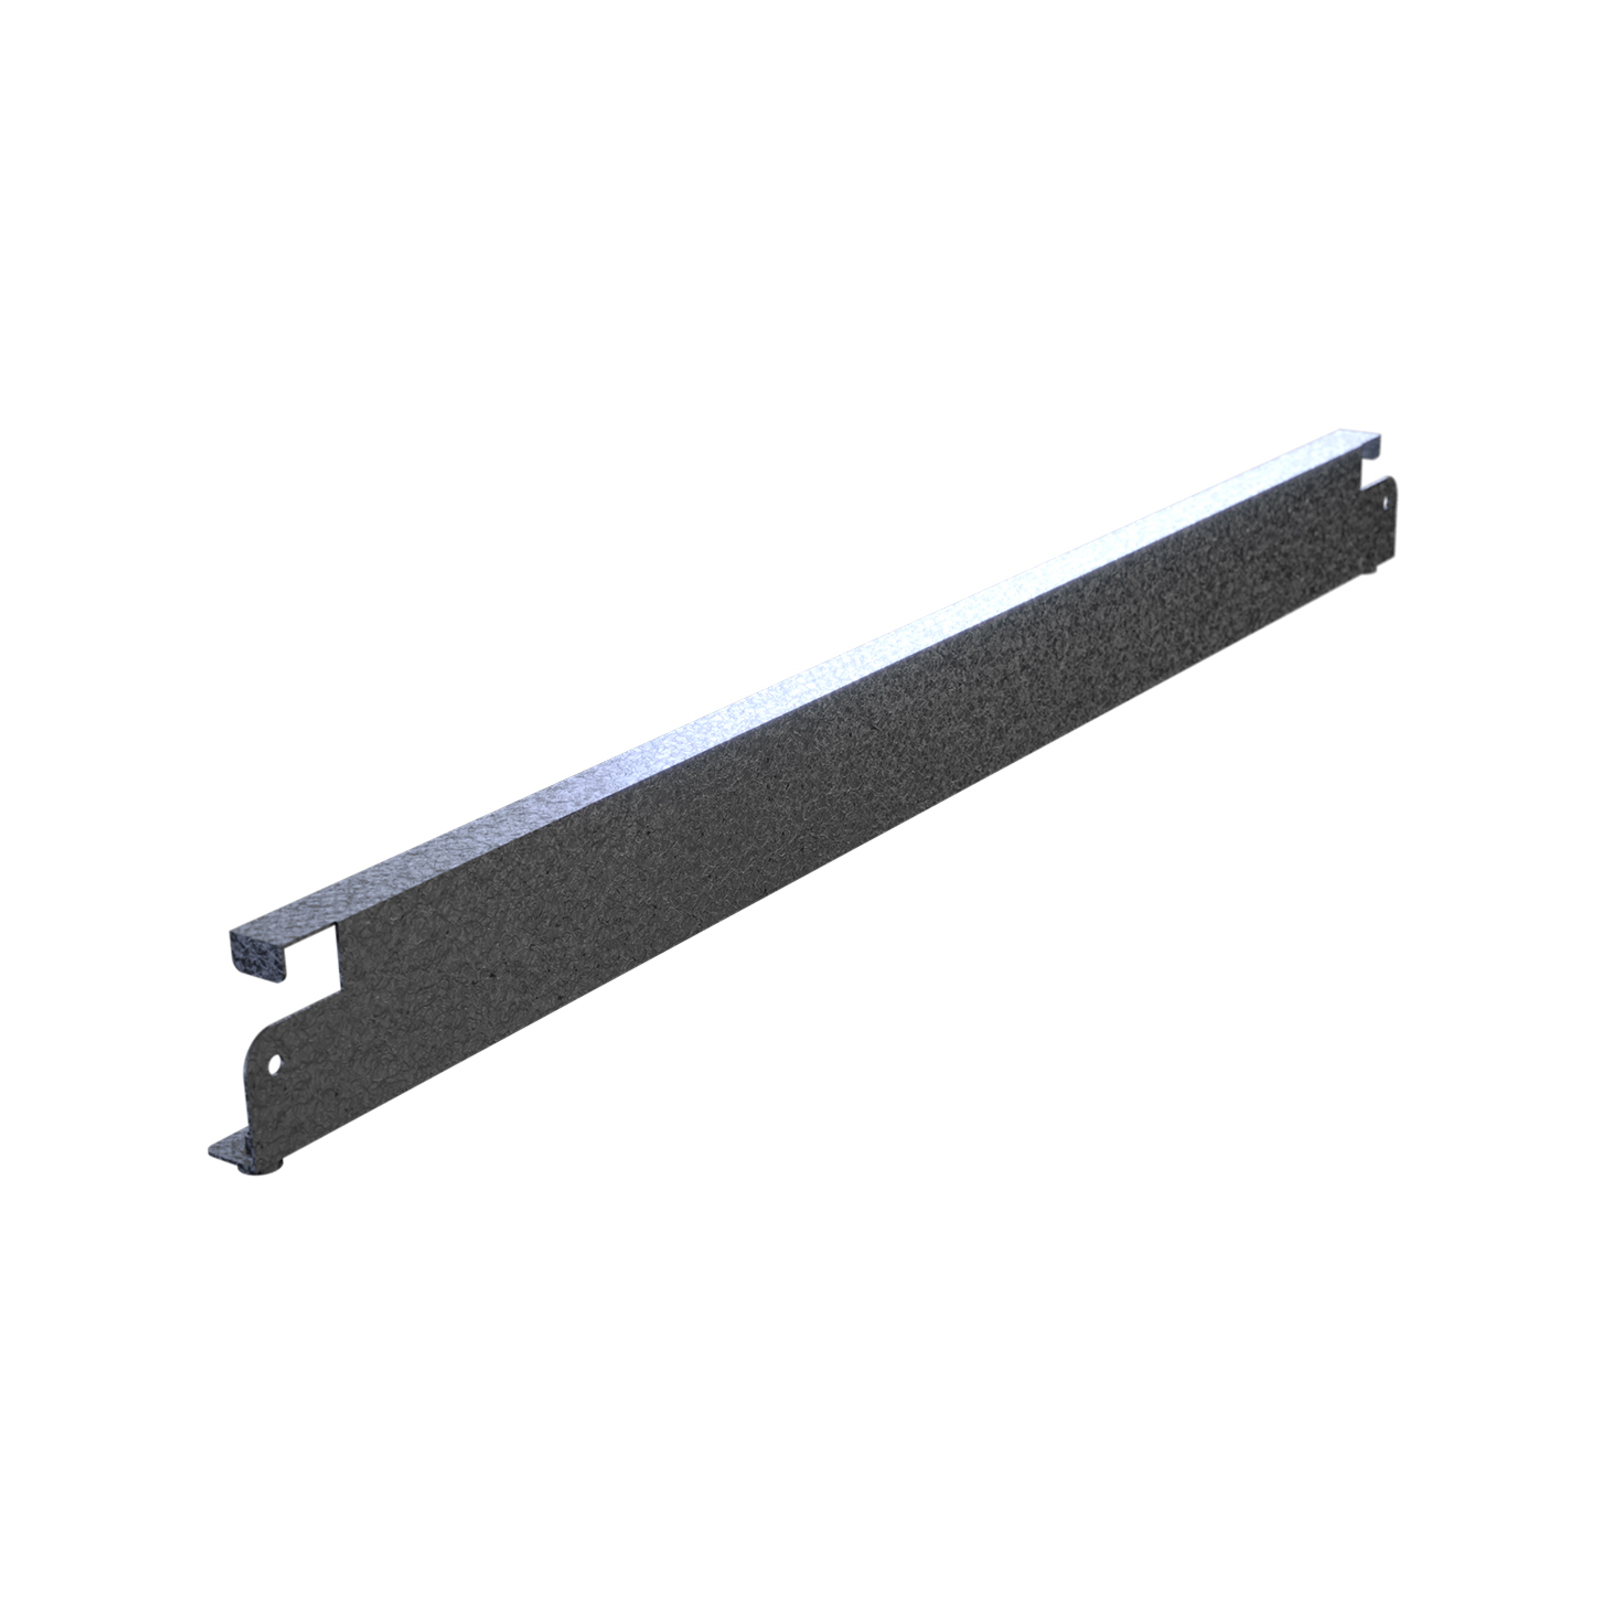 Rack It 1000KG Shelf Support Brace (For 972mm, 1264mm & 1872mm Beams)